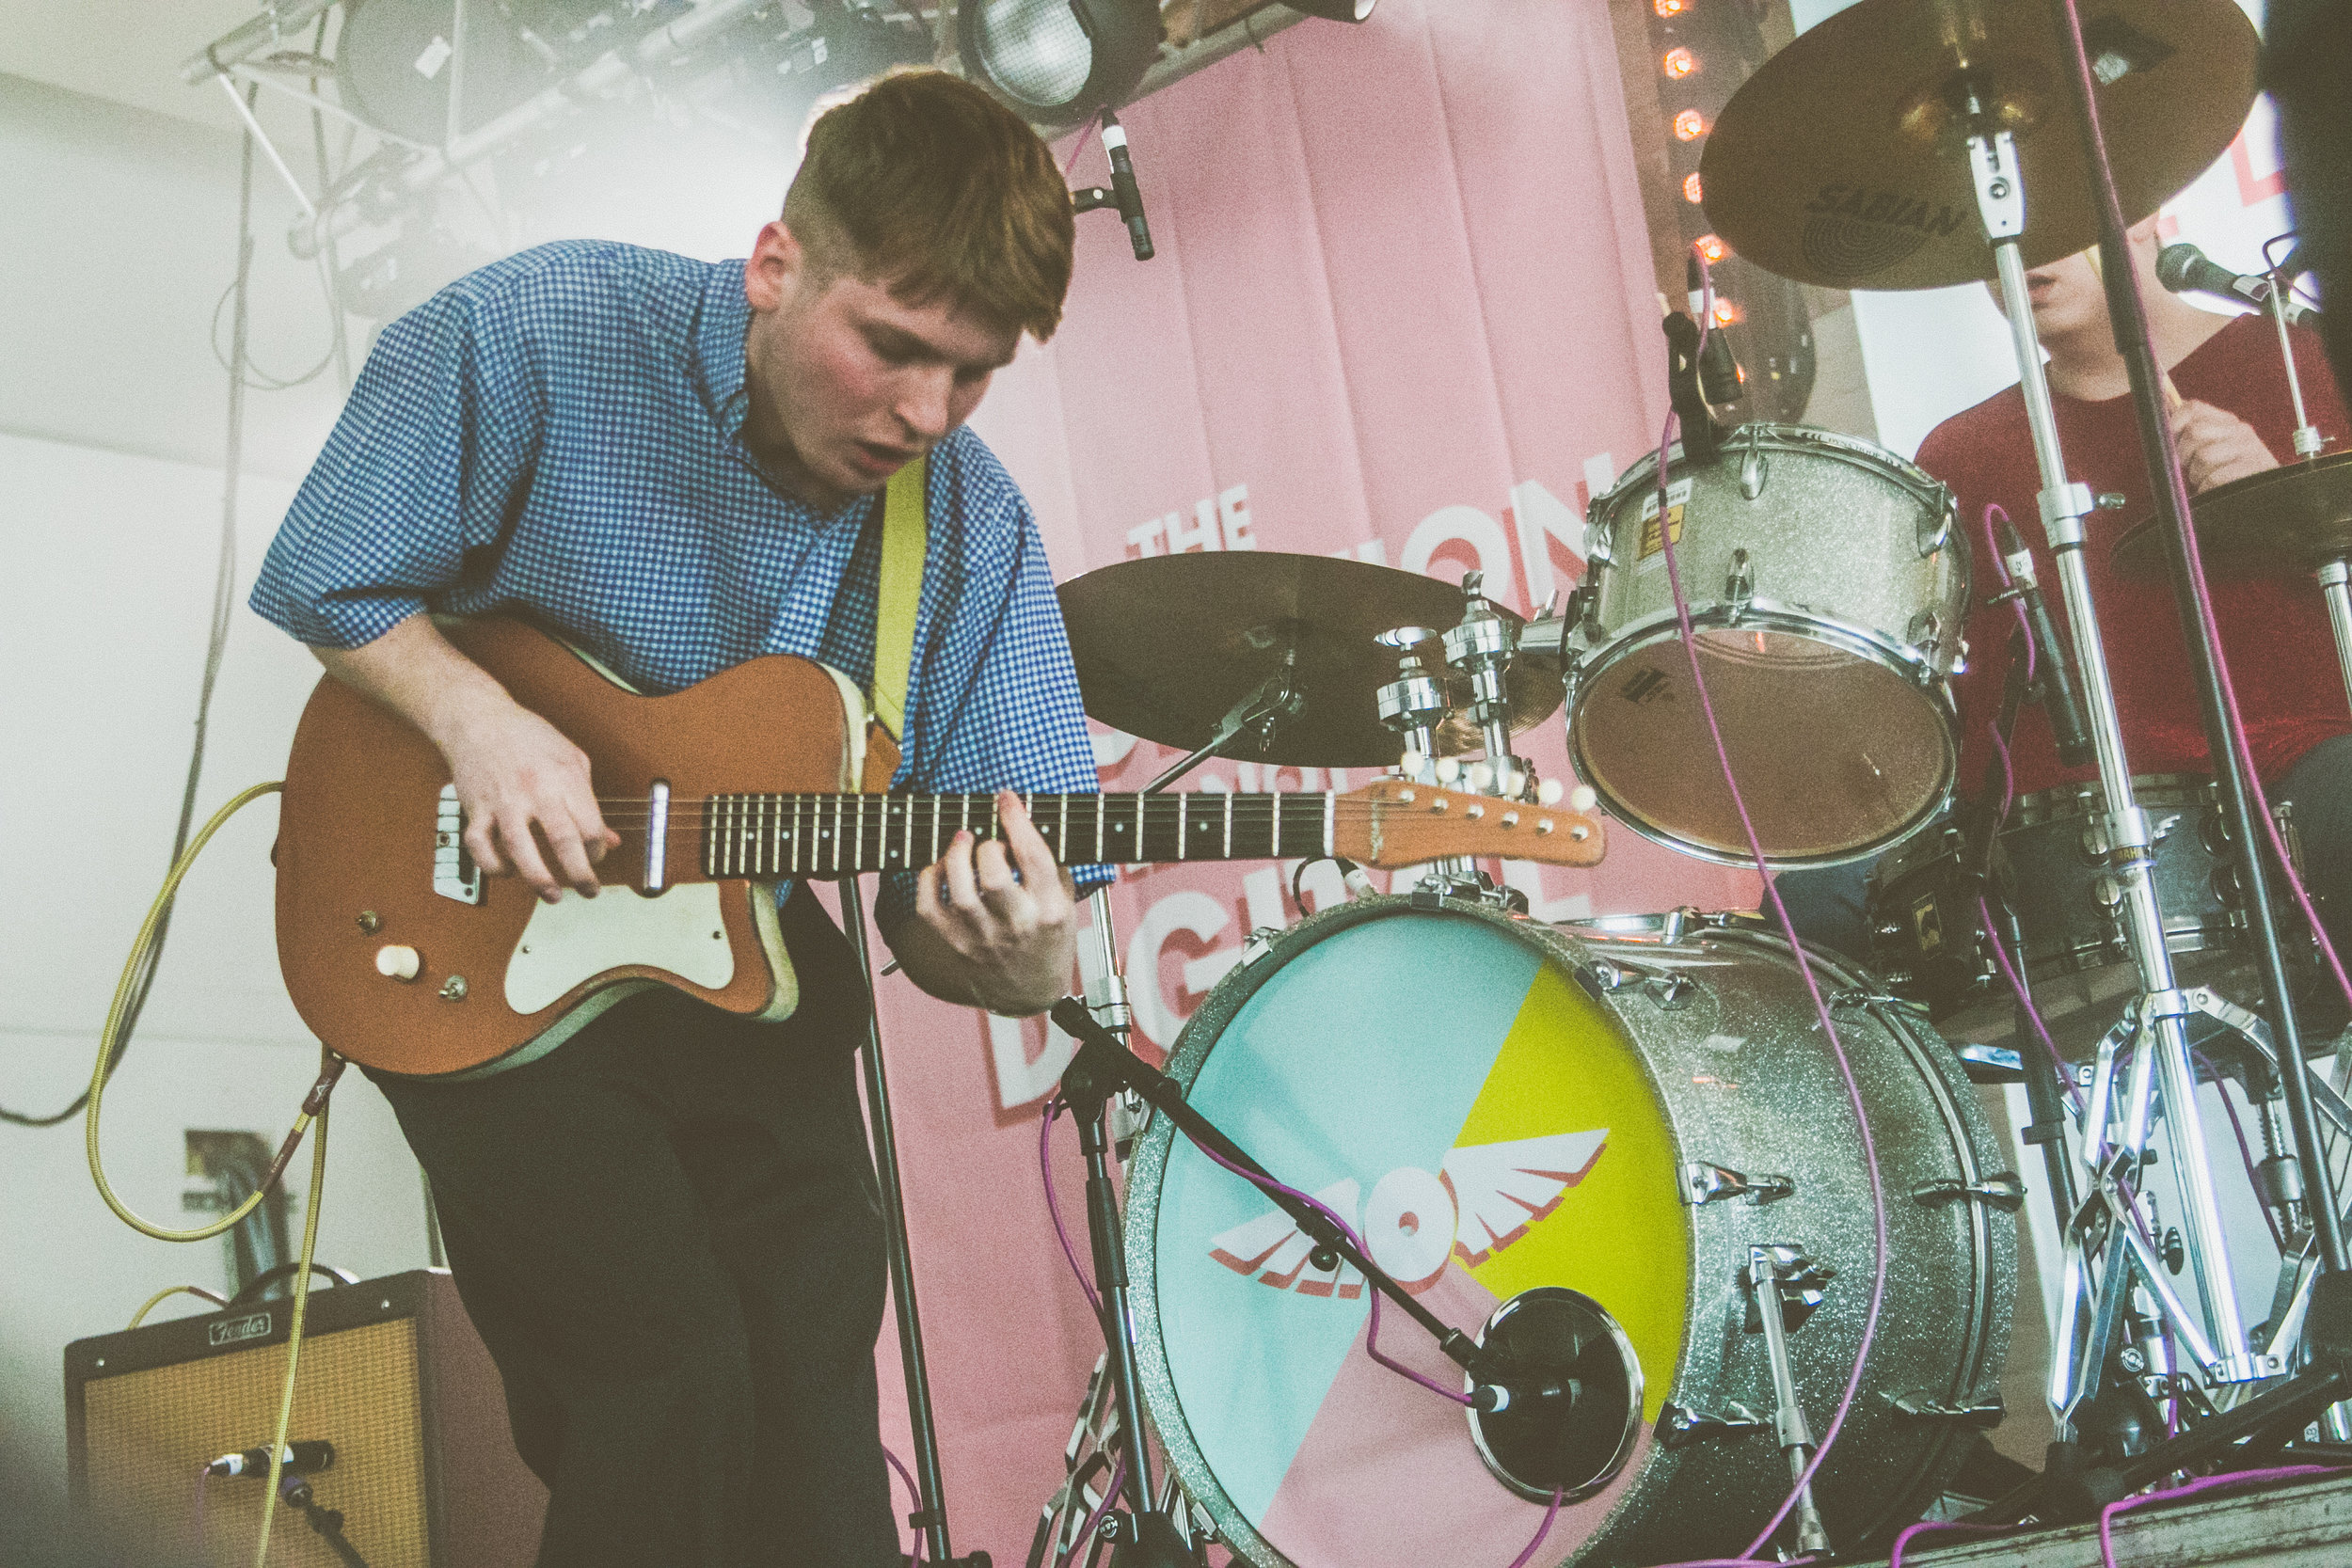 Trudy - Flying Vinyl Festival - Oval Space - 08.04.2017-7.jpg